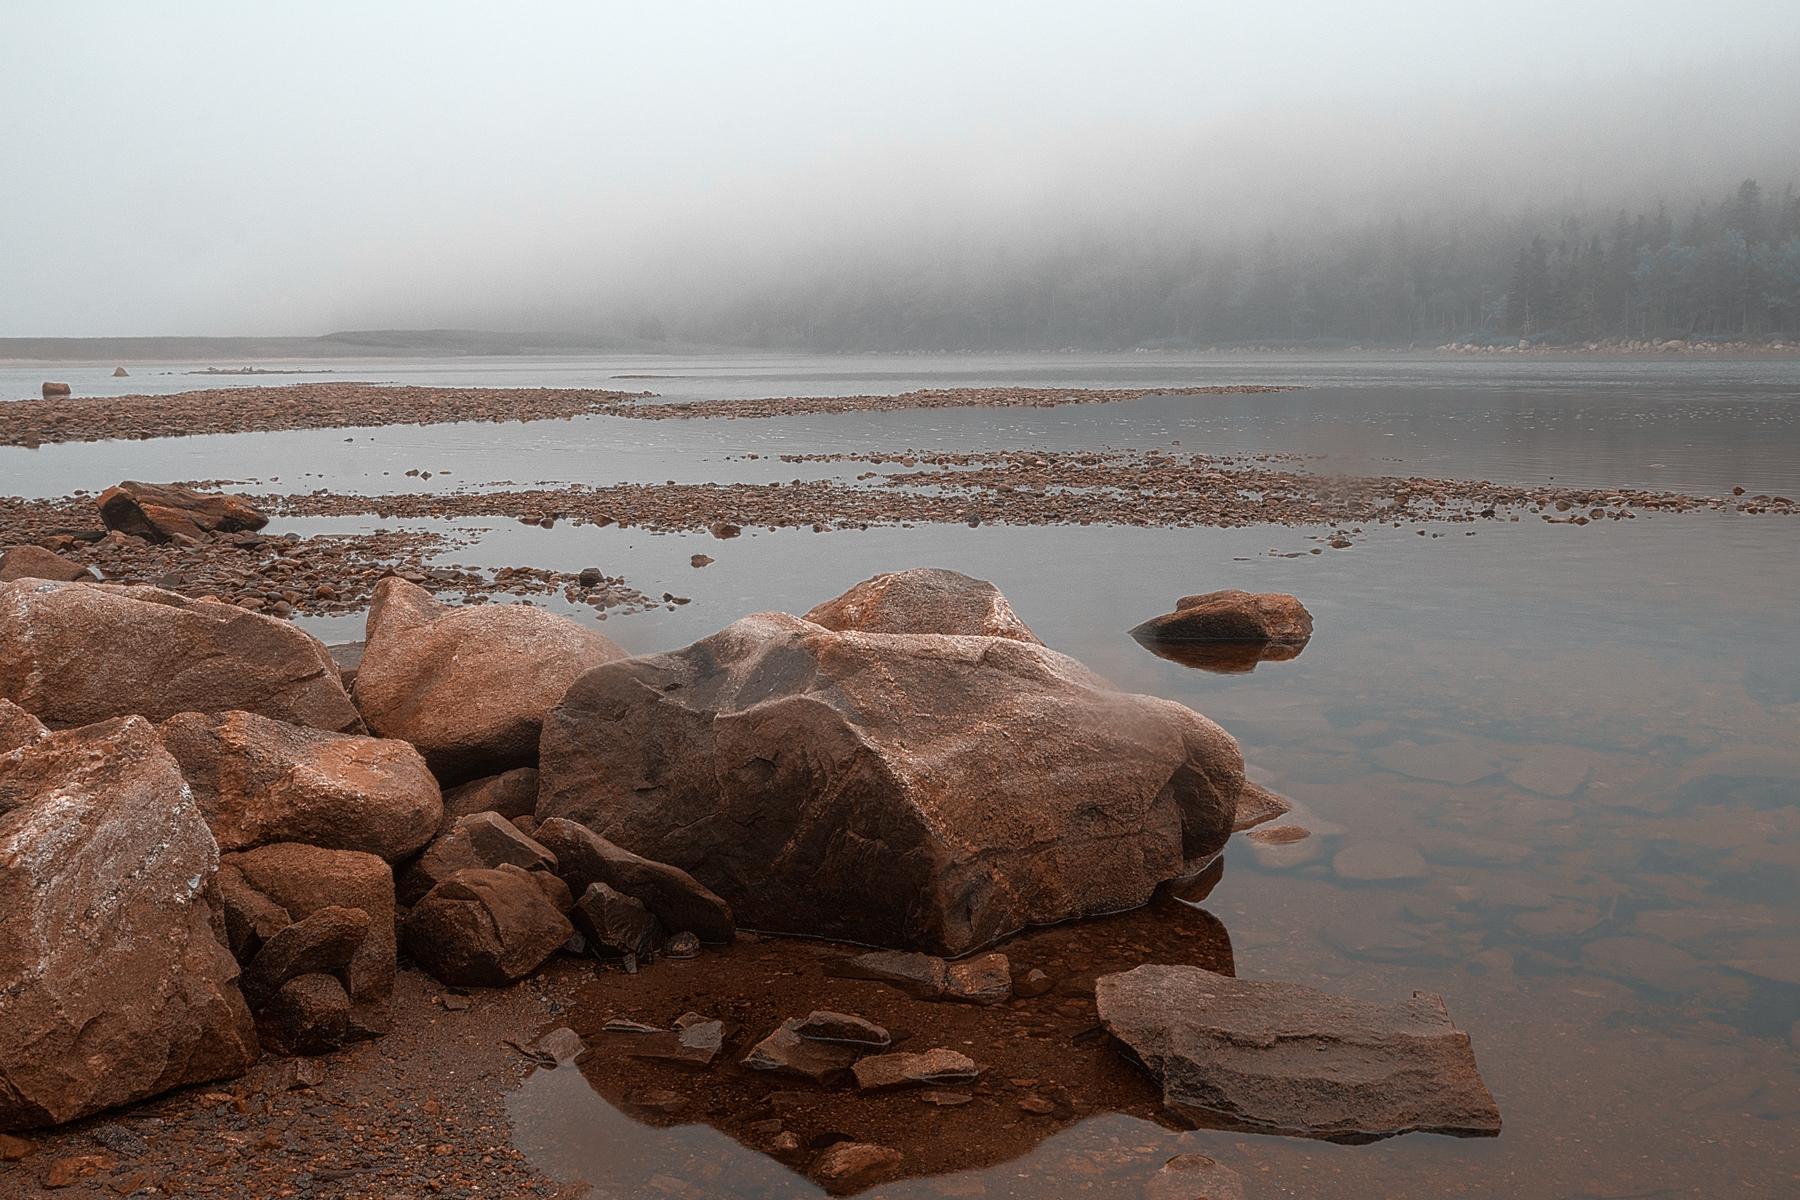 Cape breton mist - hdr photo